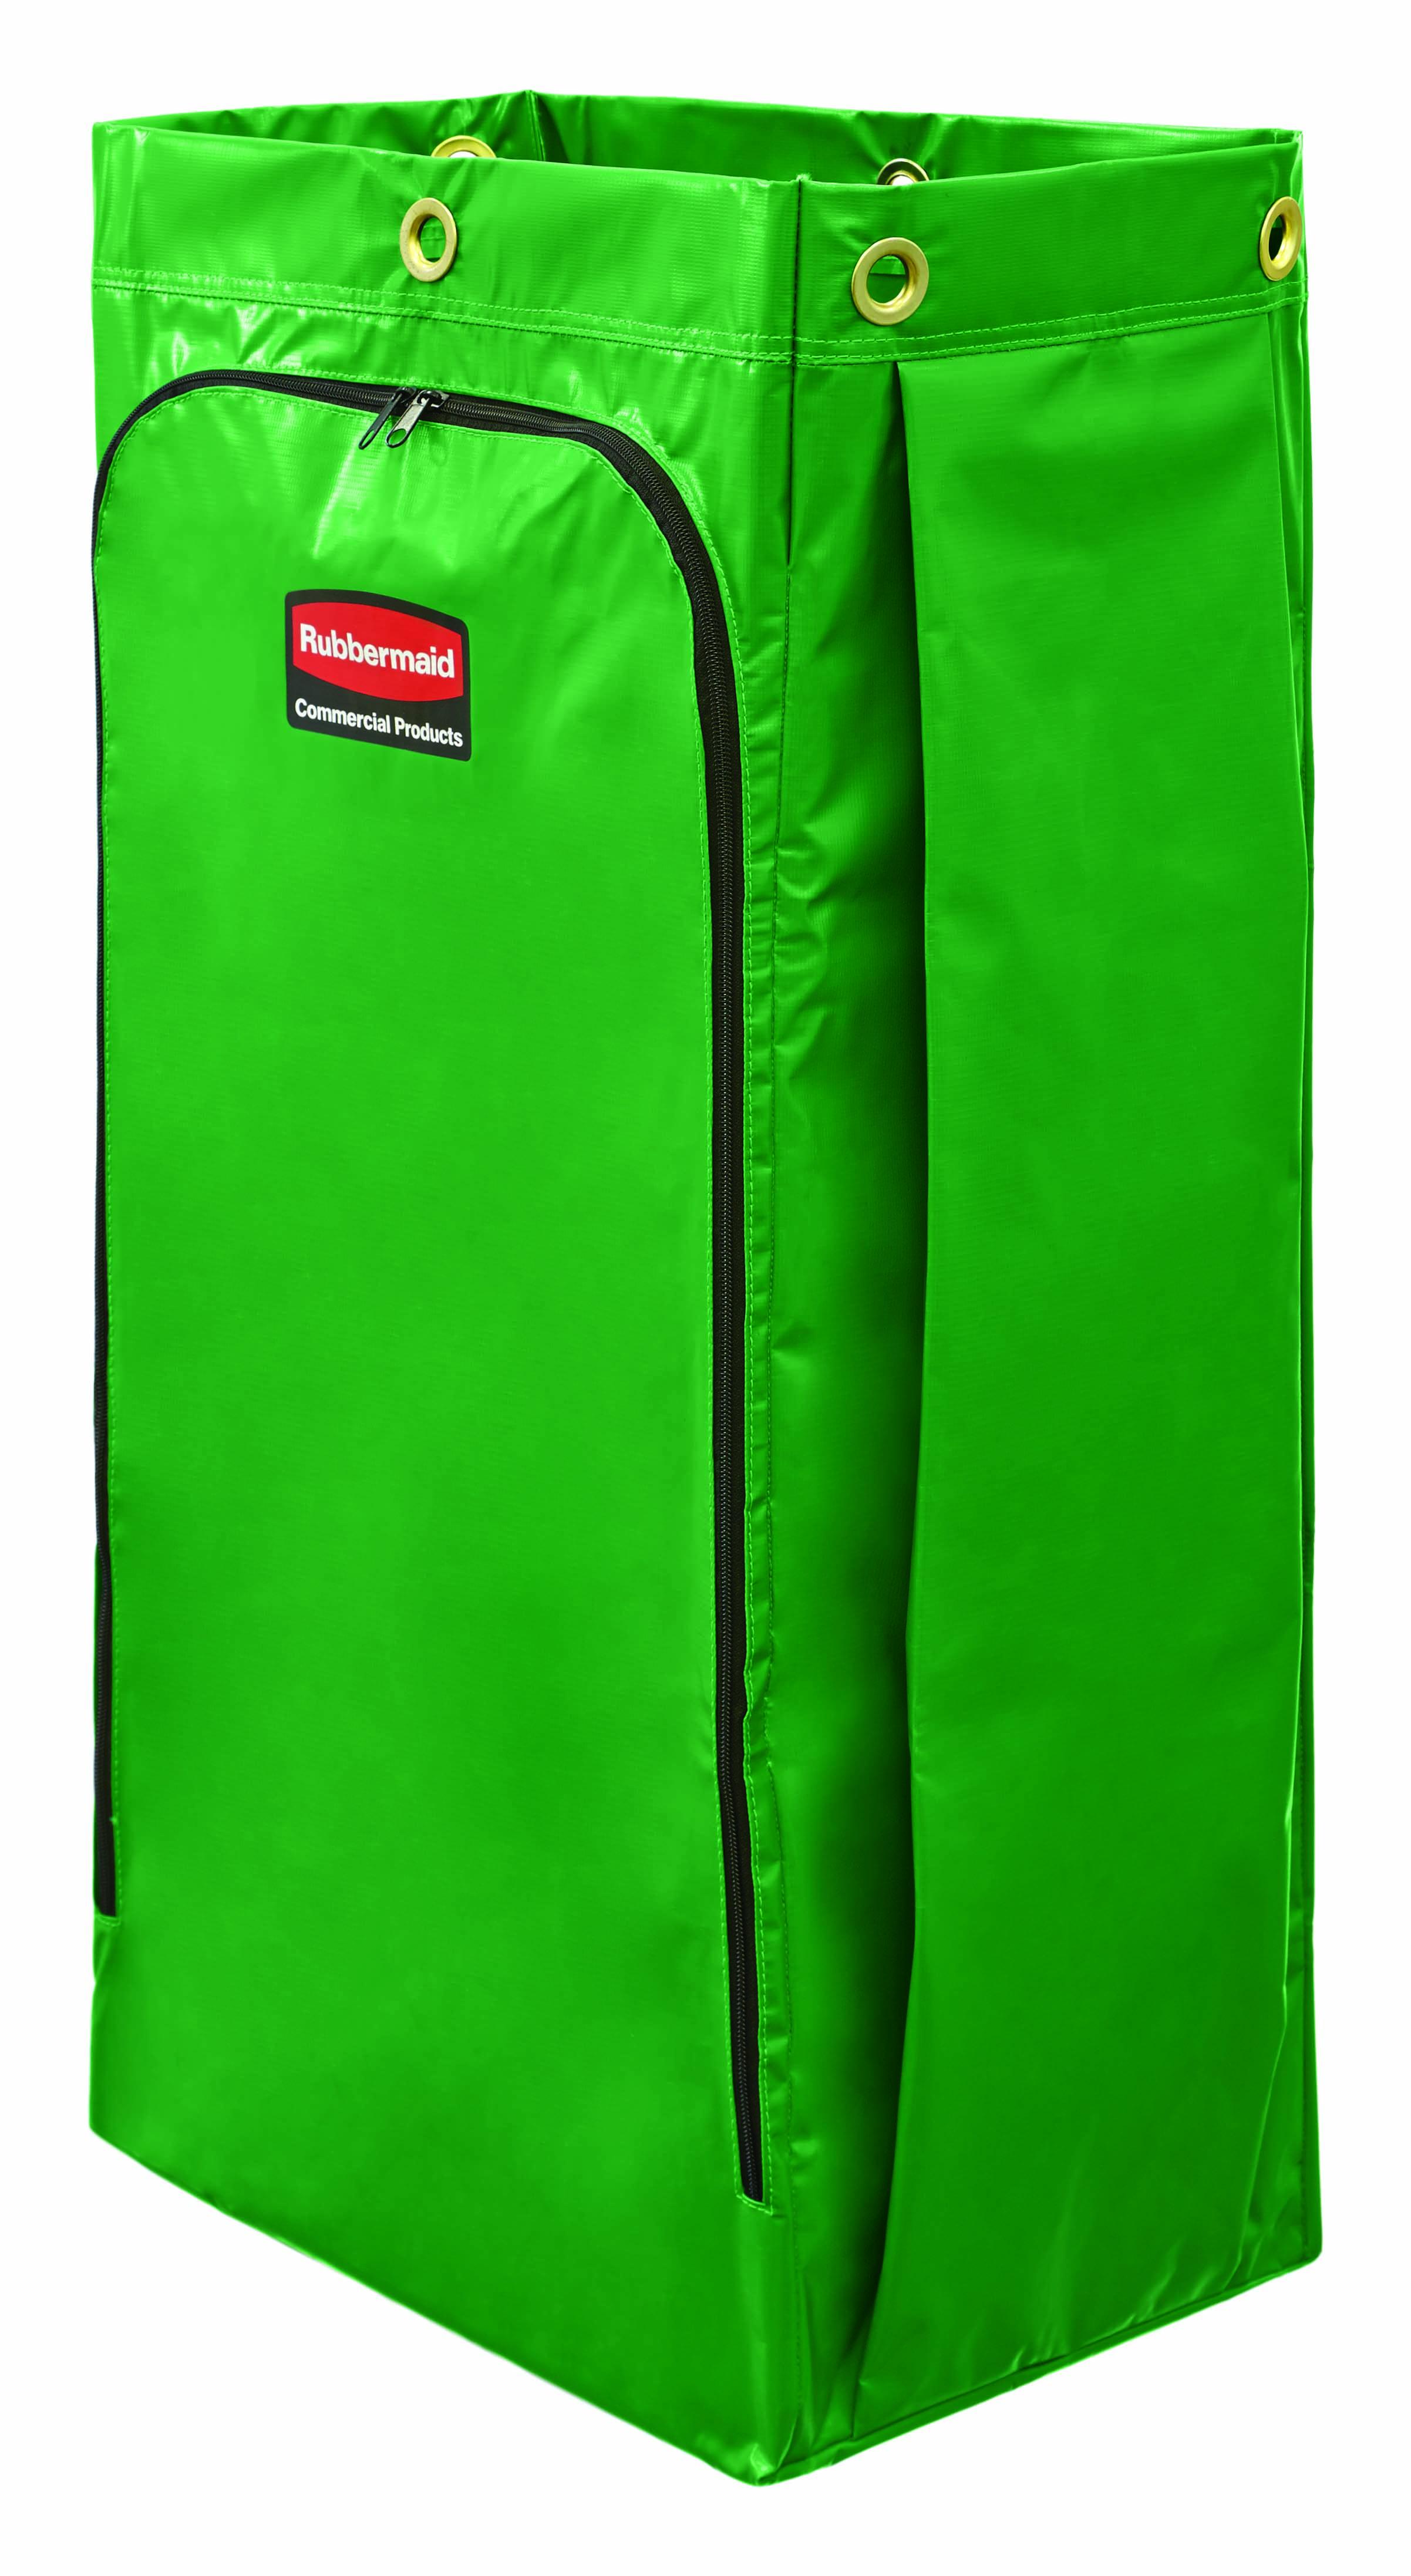 Recycling-Sack mit Universal-Recyclingsymbol-Grün